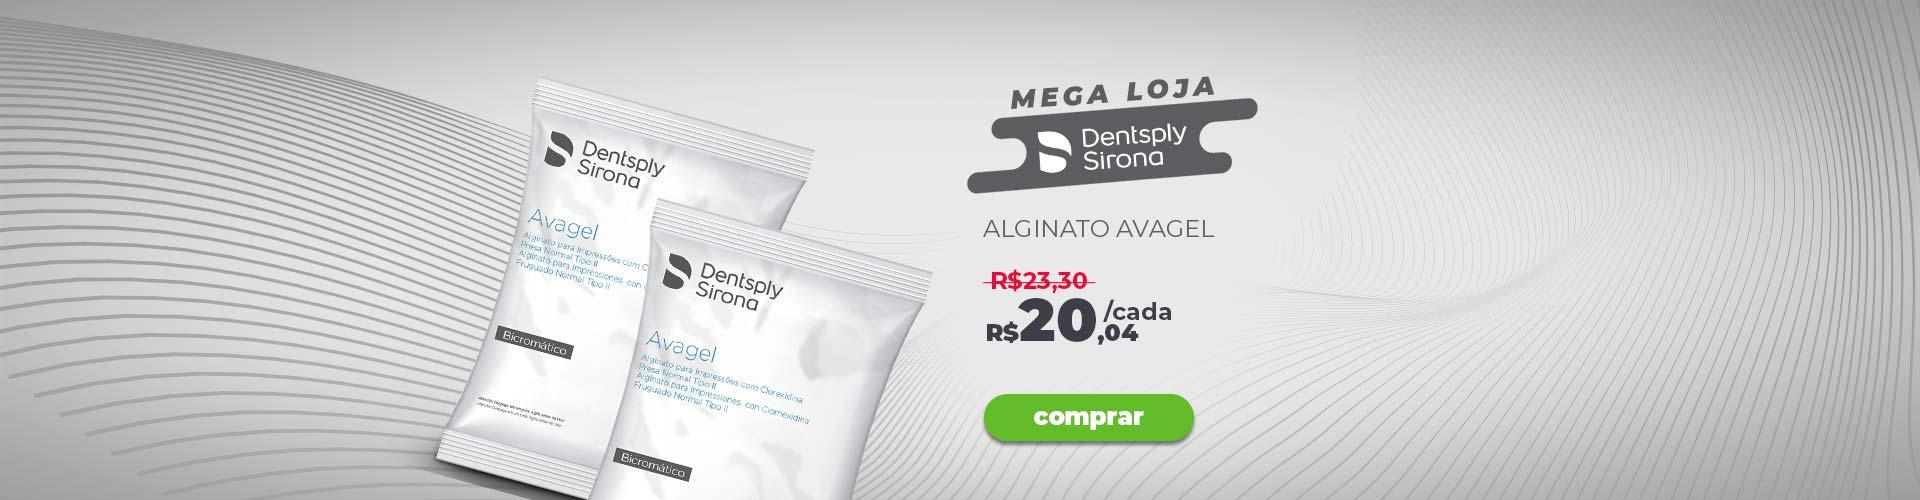 Banner Dentsply Mega loja - Avagel